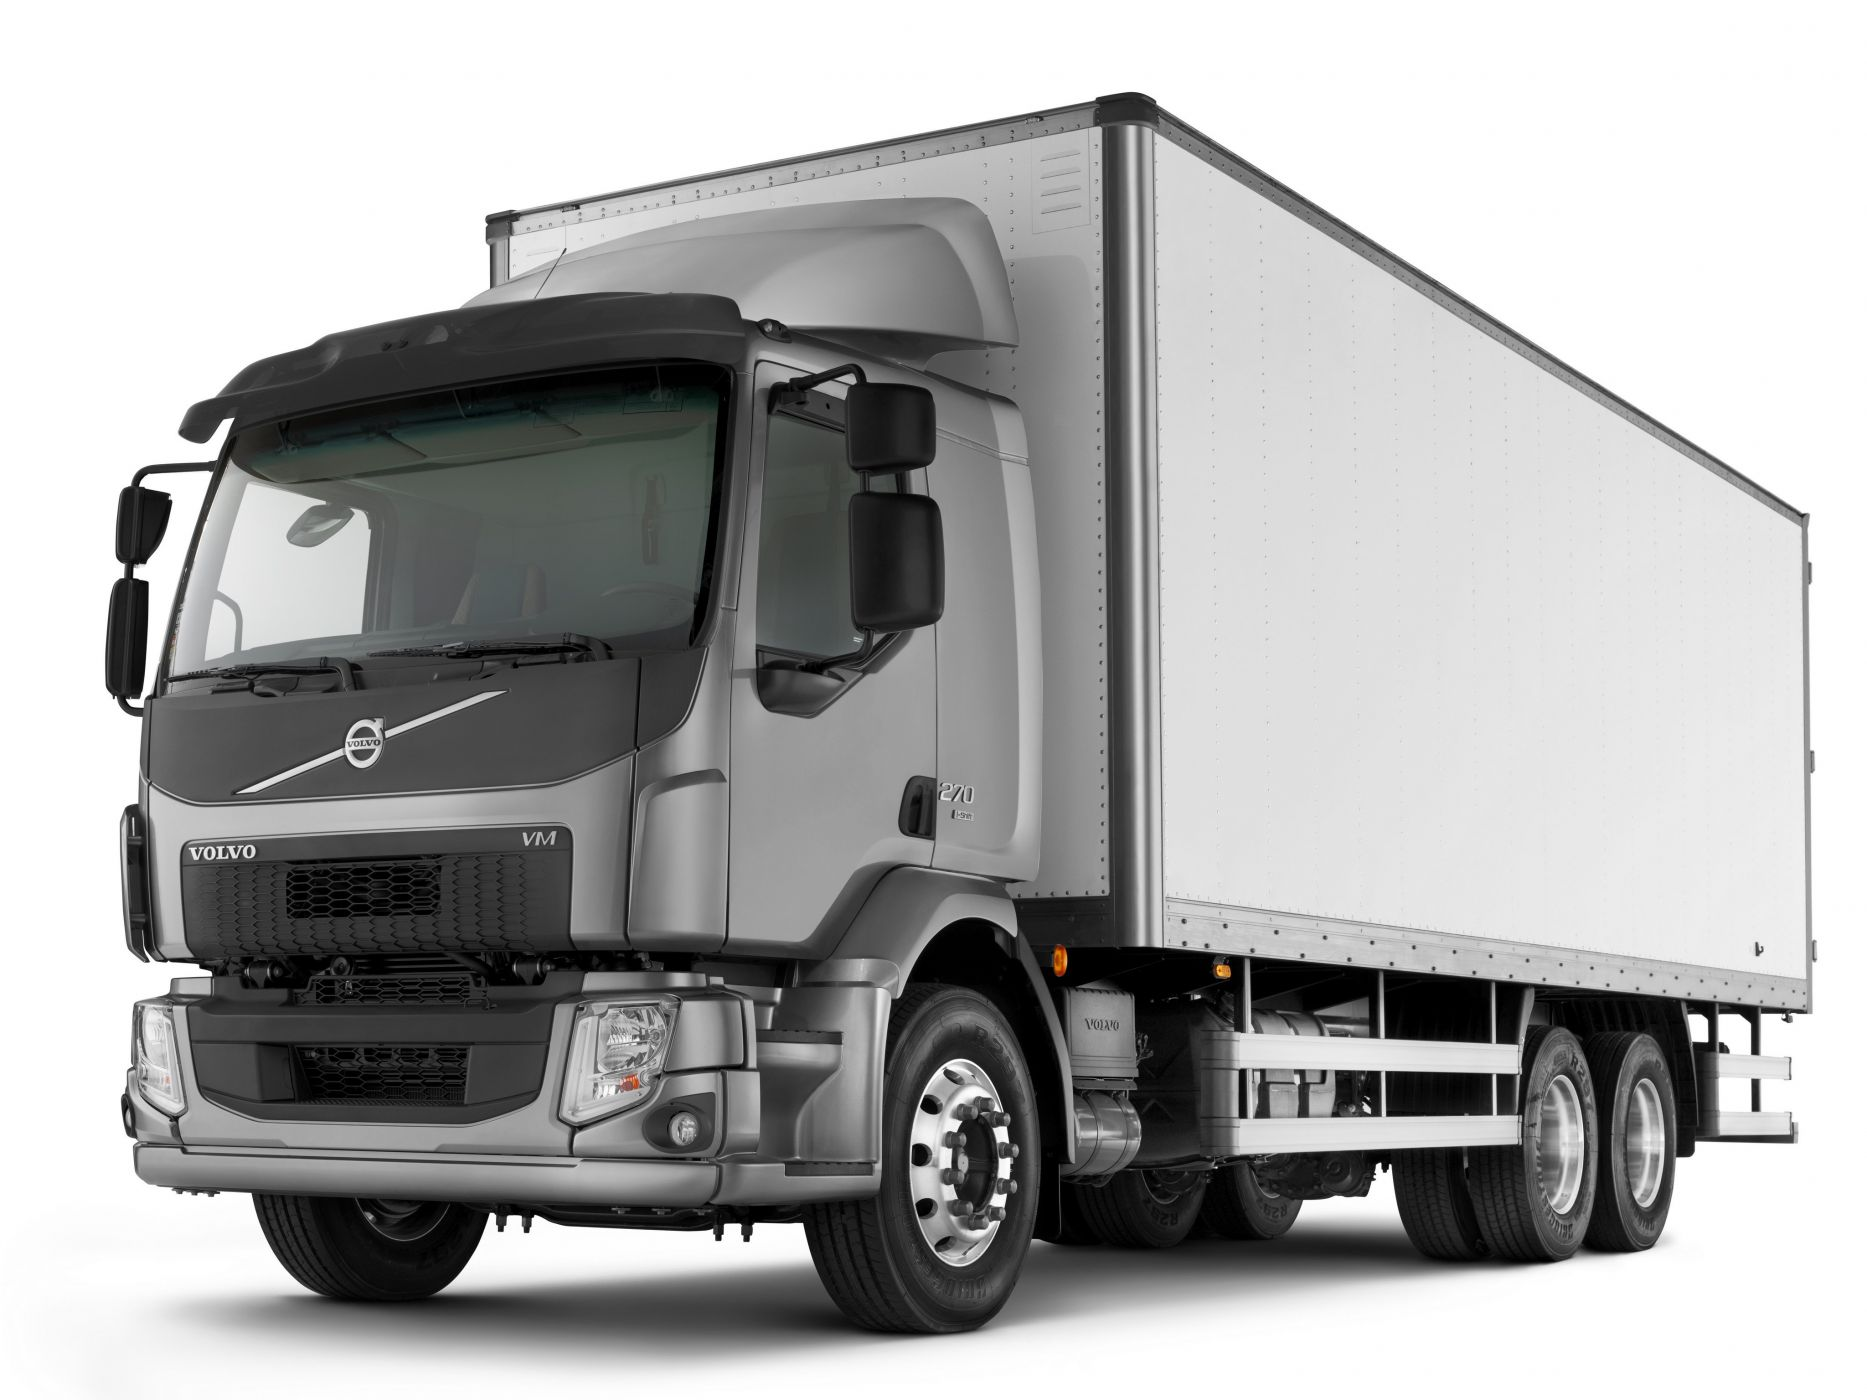 Volvo изотерма 20 тонн